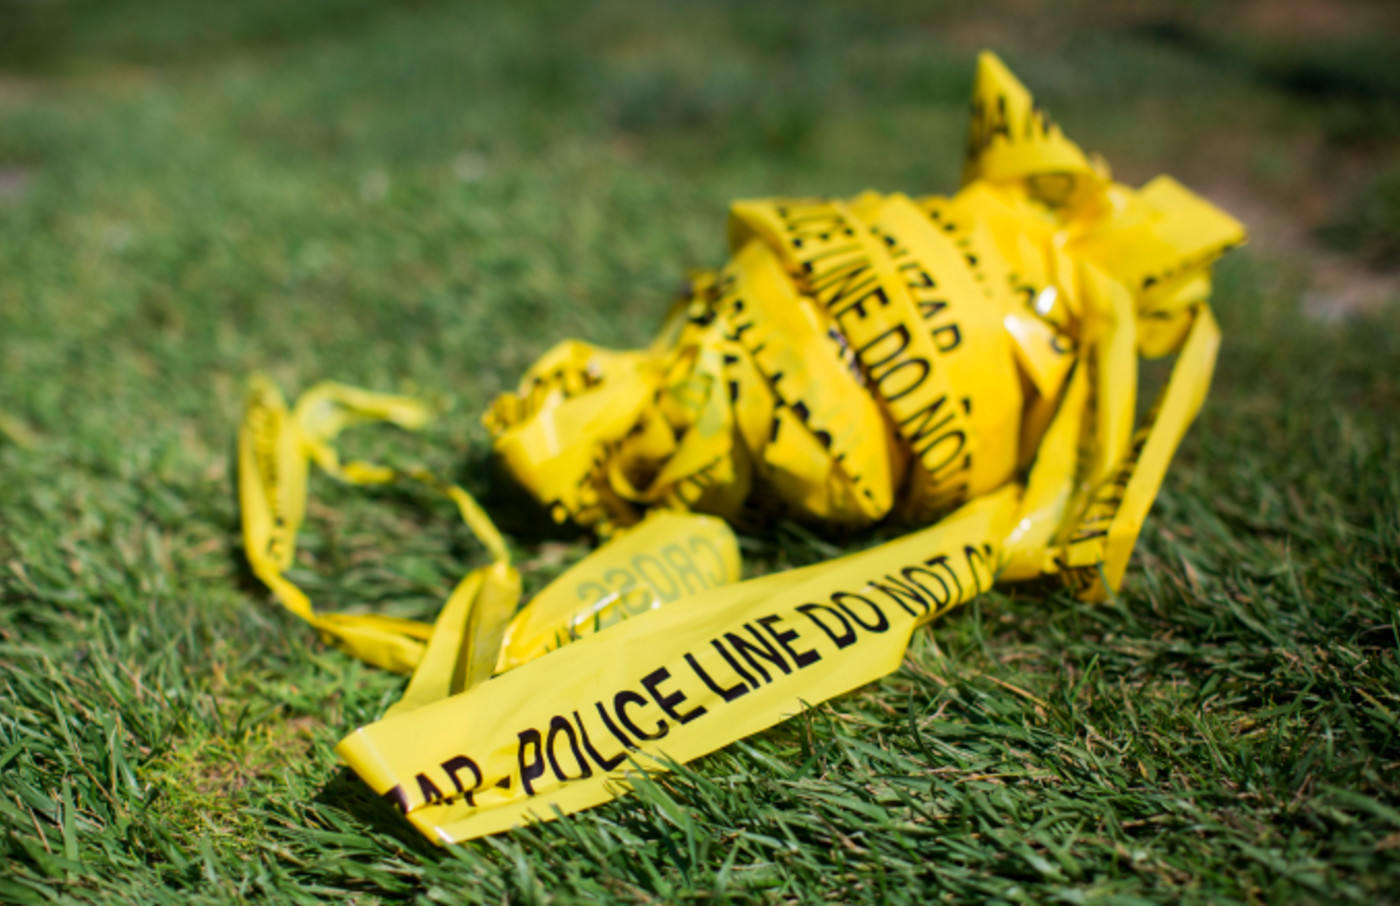 A bundle of police crime scene tape